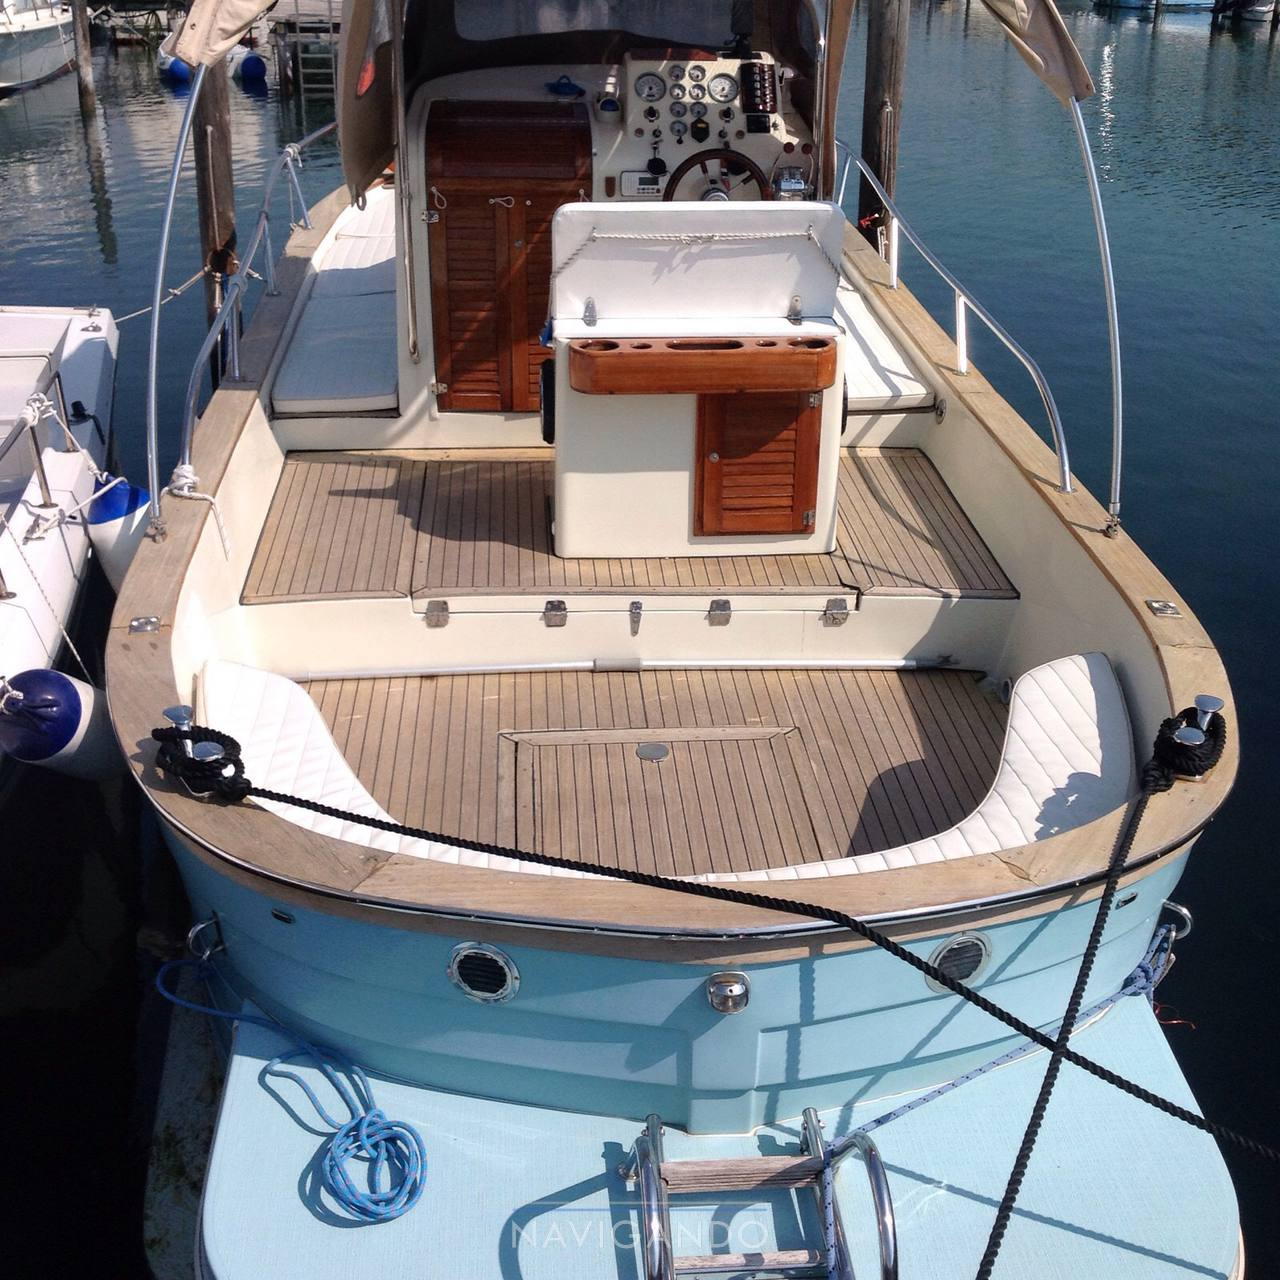 Plastimare gozzo Amelia Gozzo amelia 800 Motor boat used for sale